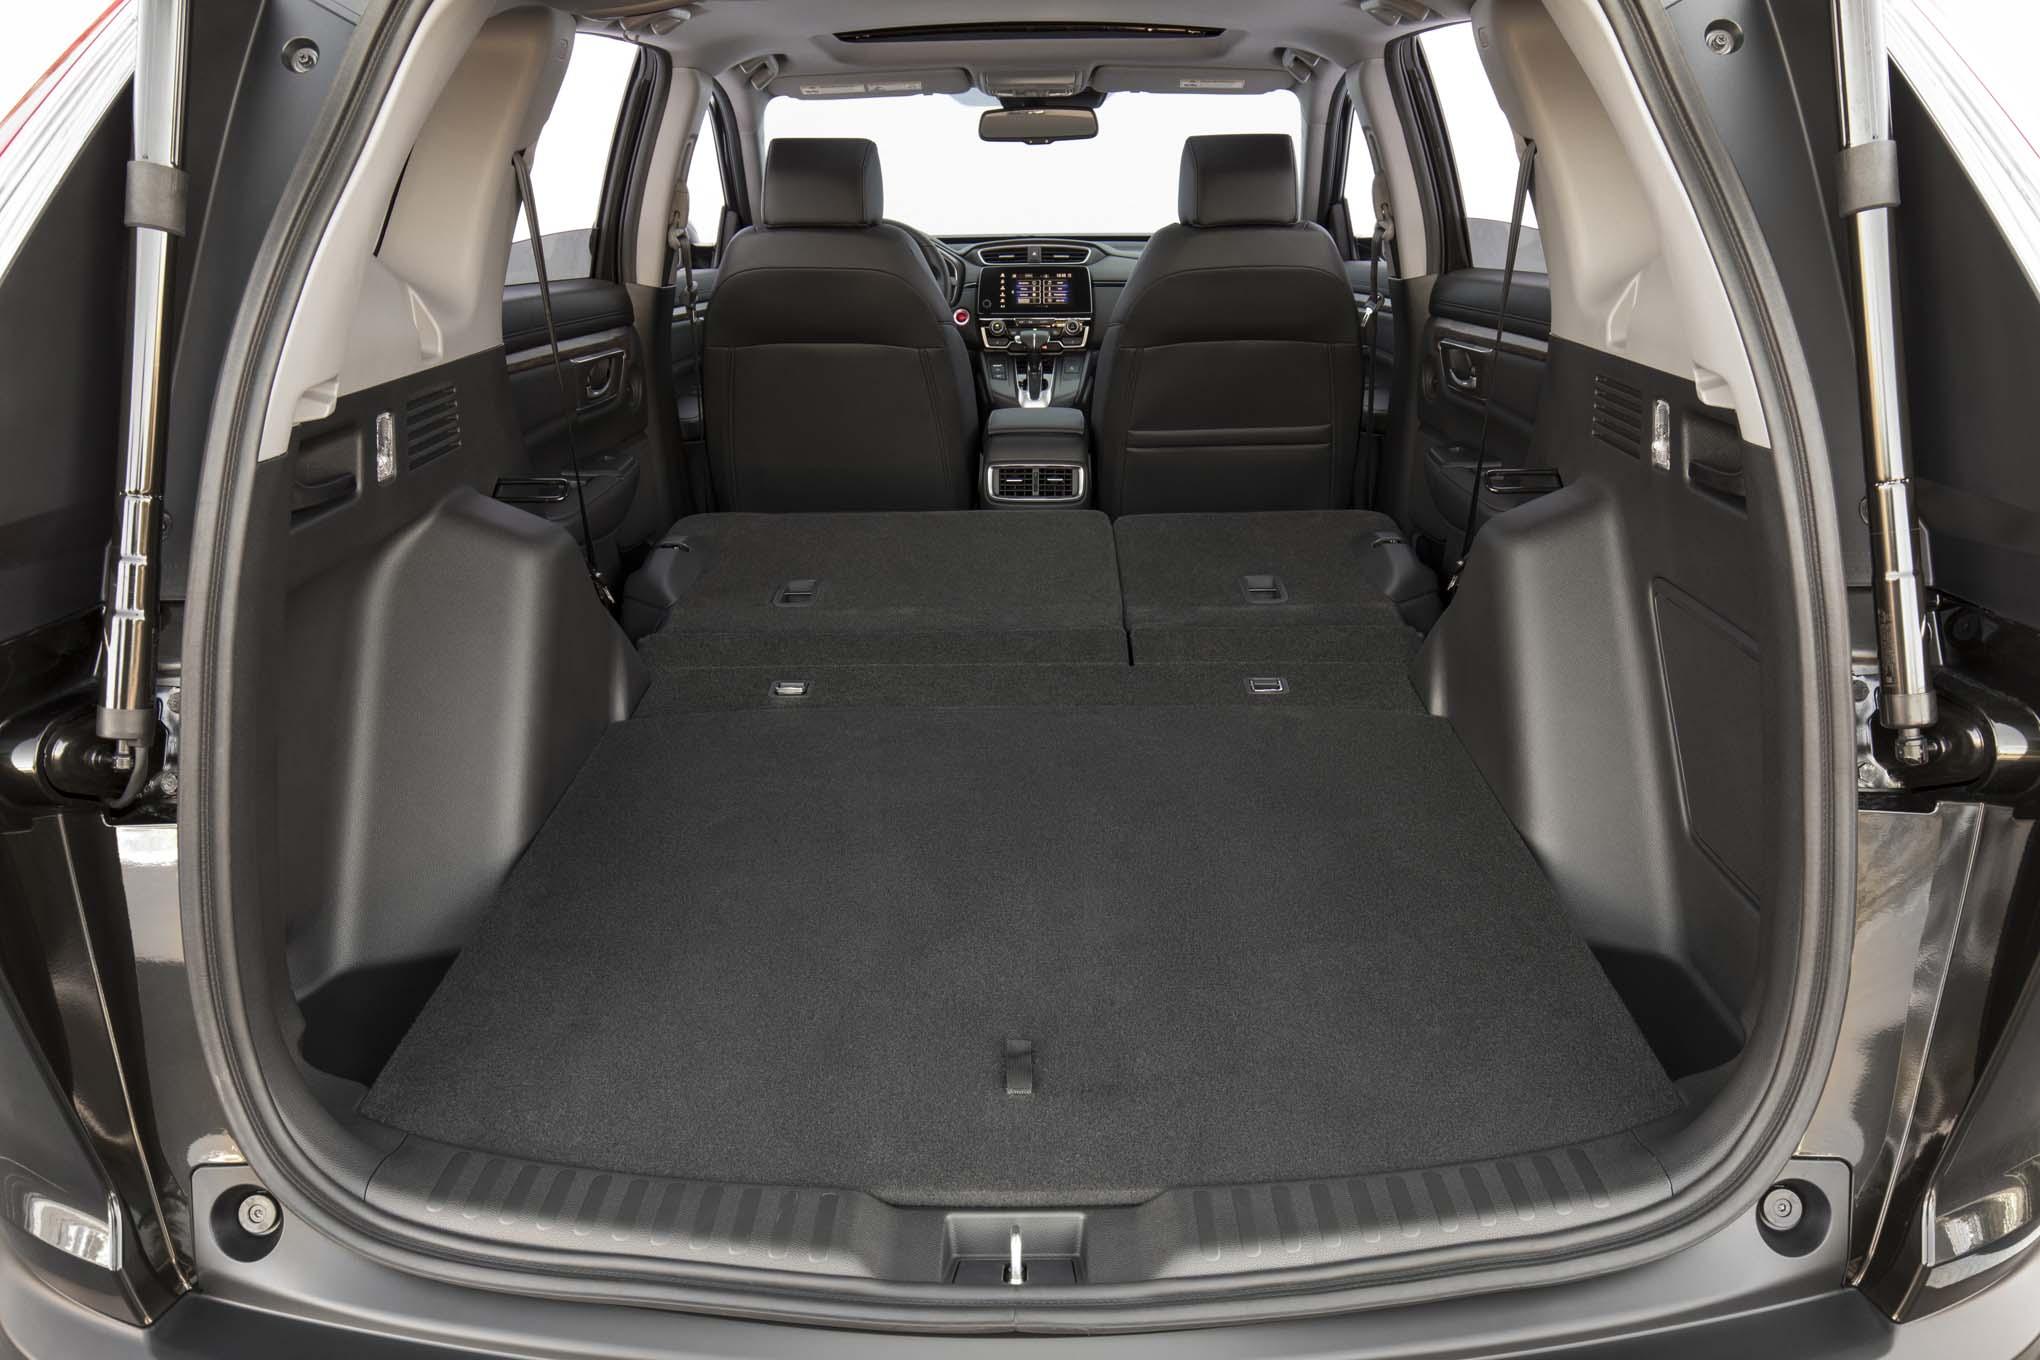 2017 honda cr v touring first drive review automobile for Honda accord cargo space